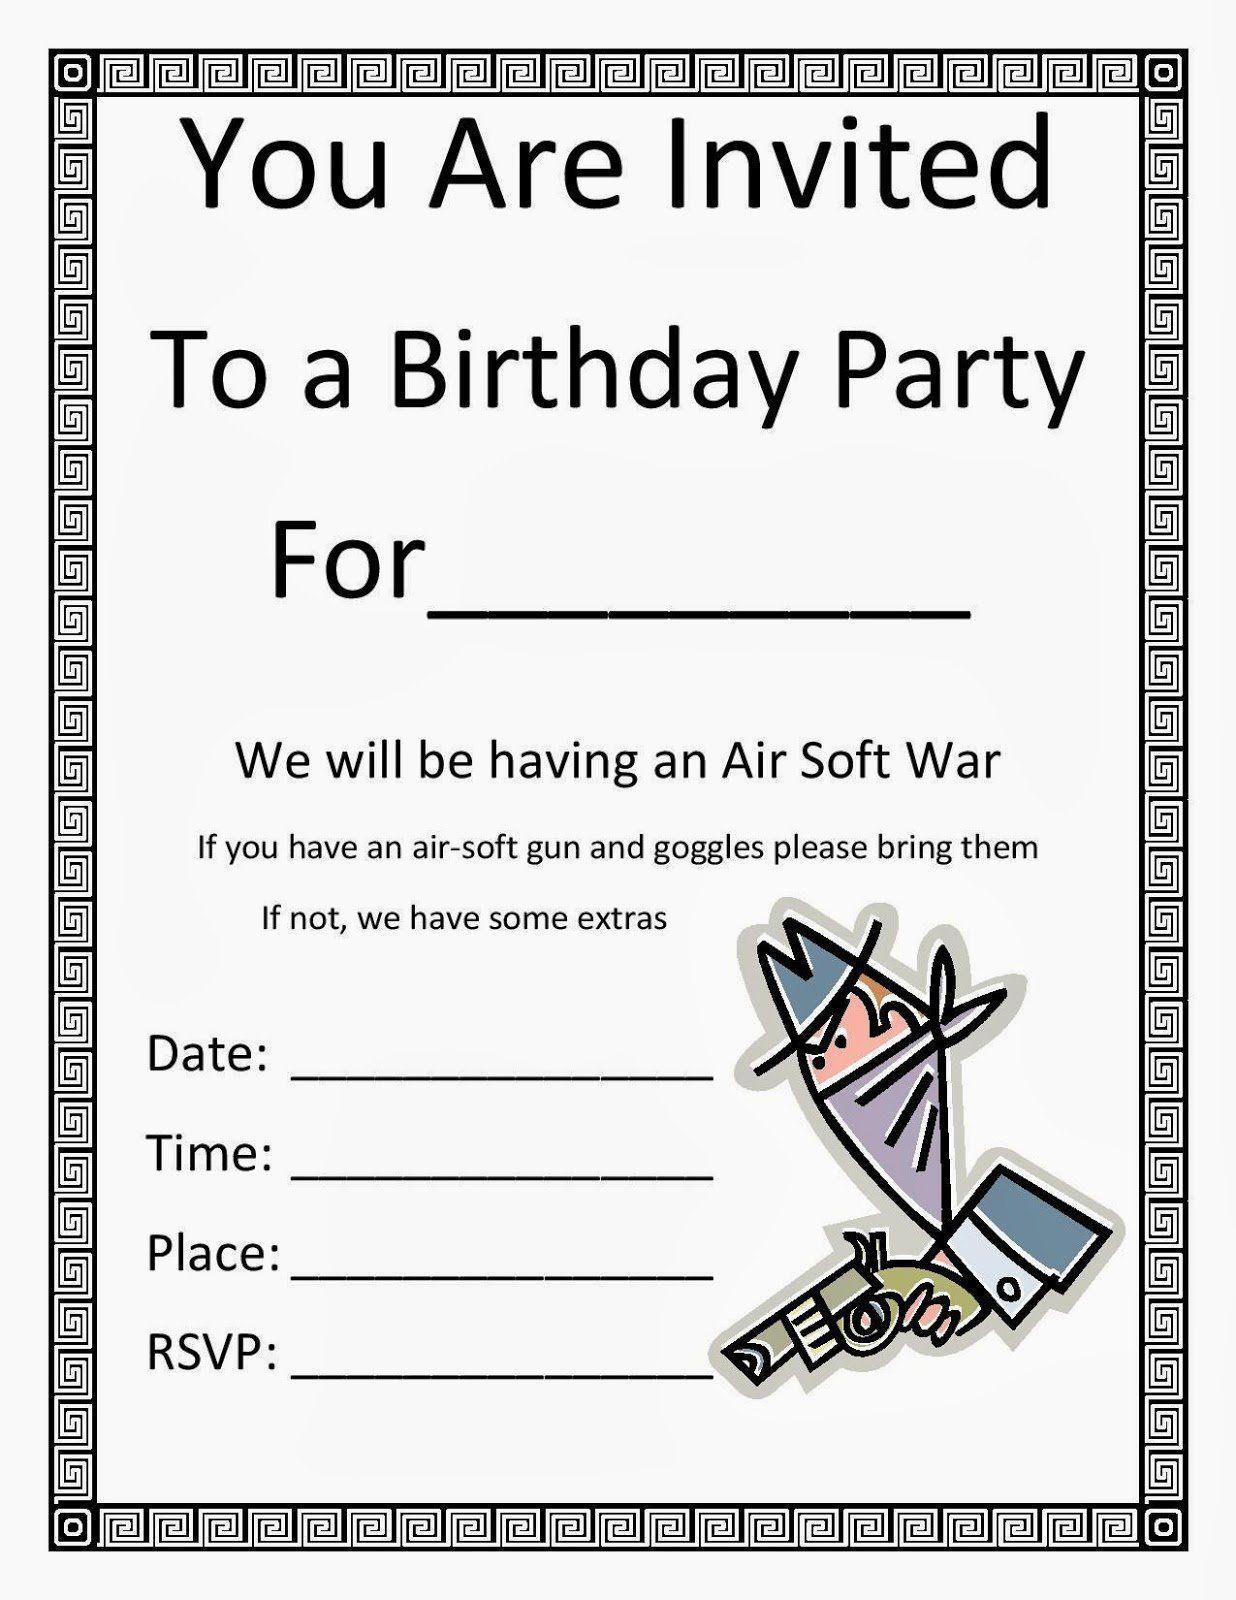 000 Marvelou Microsoft Word Birthday Invitation Template Sample  Editable 50th 60thFull